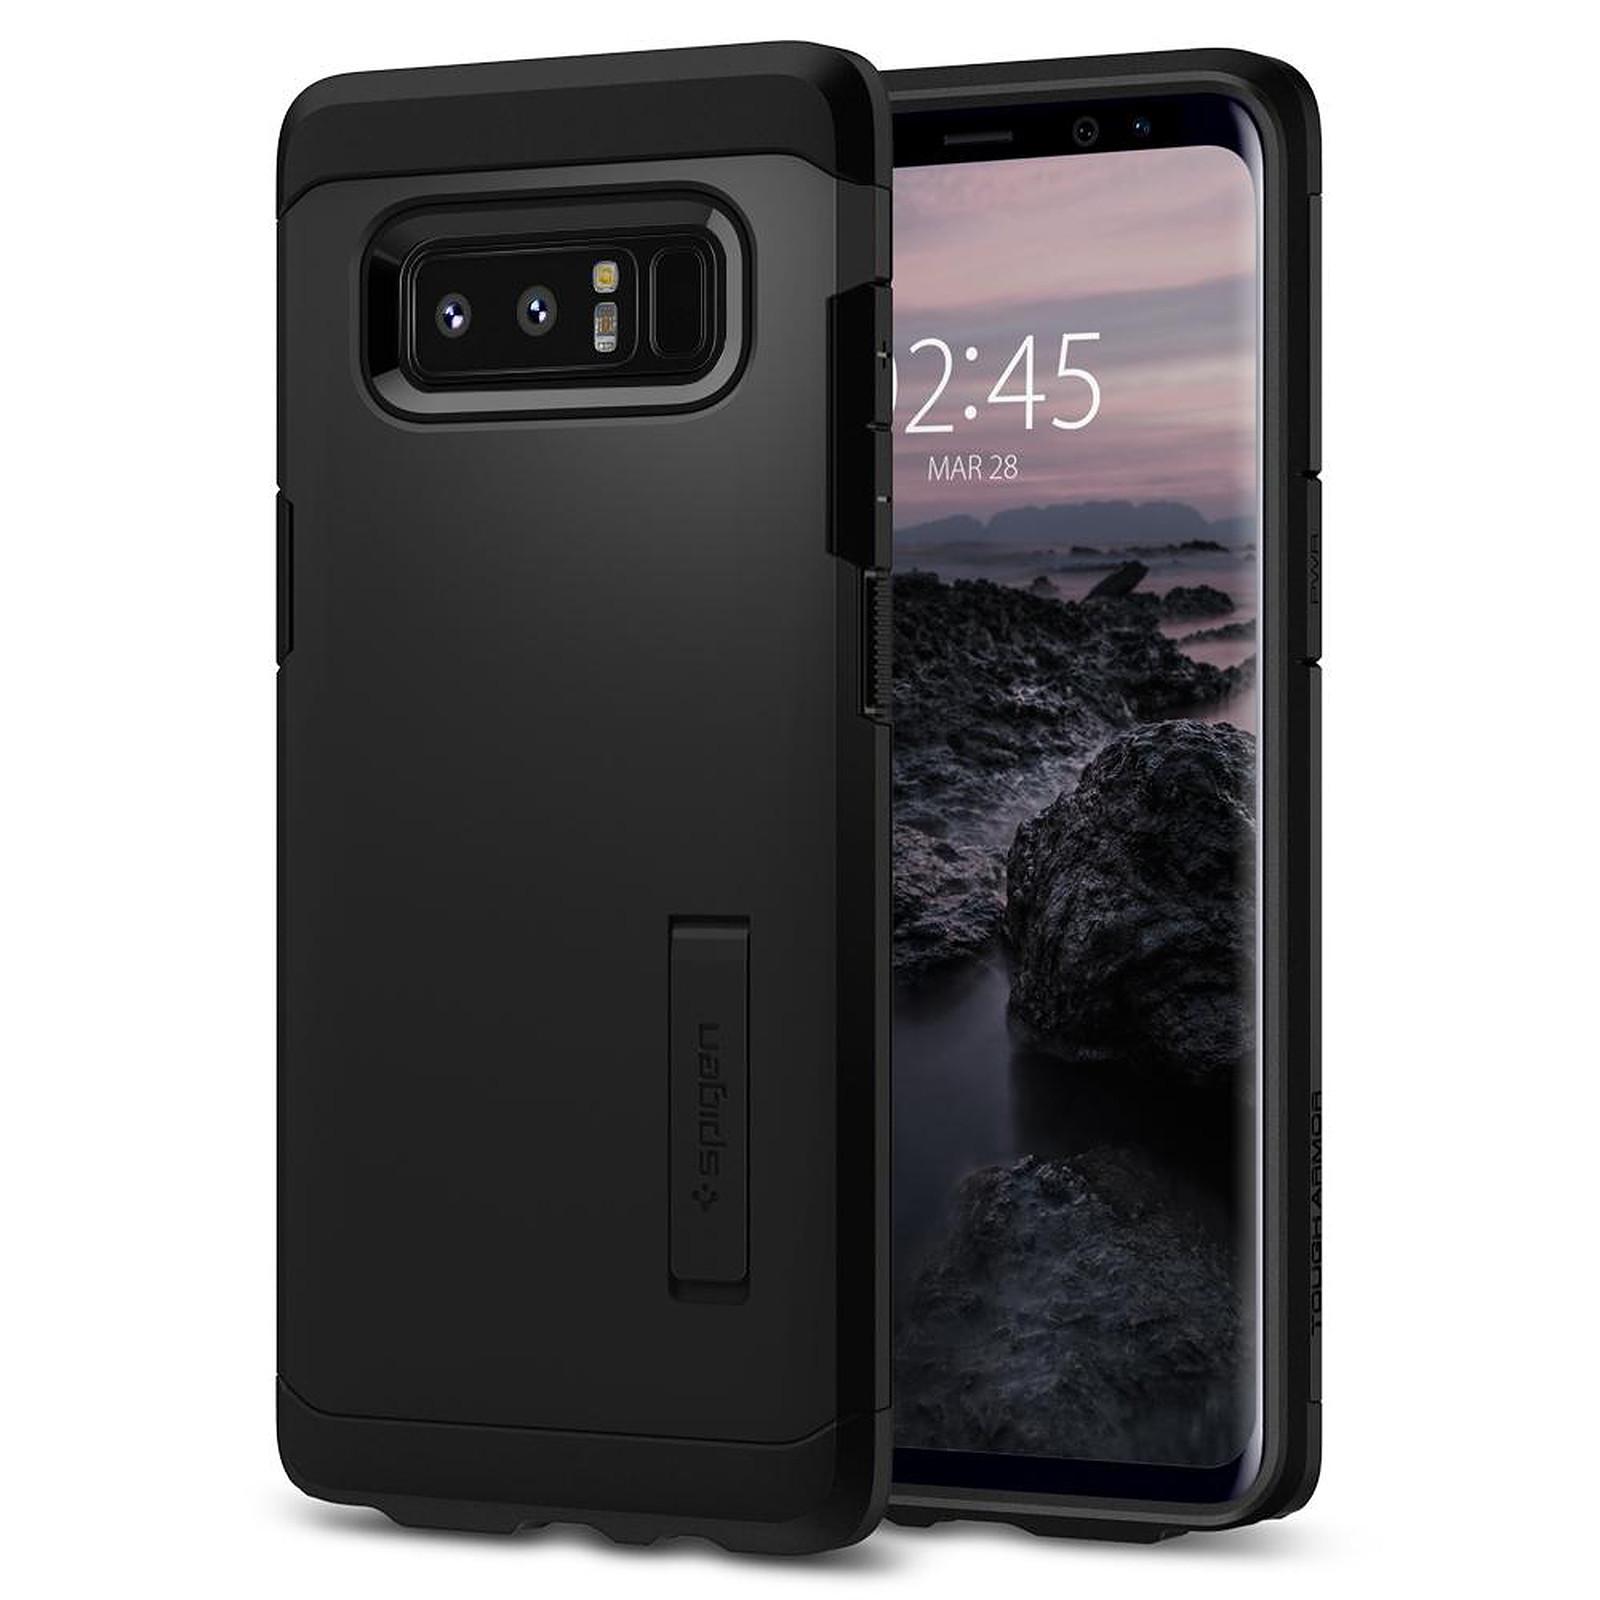 Spigen Case Tough Armor Noir Galaxy Note 8